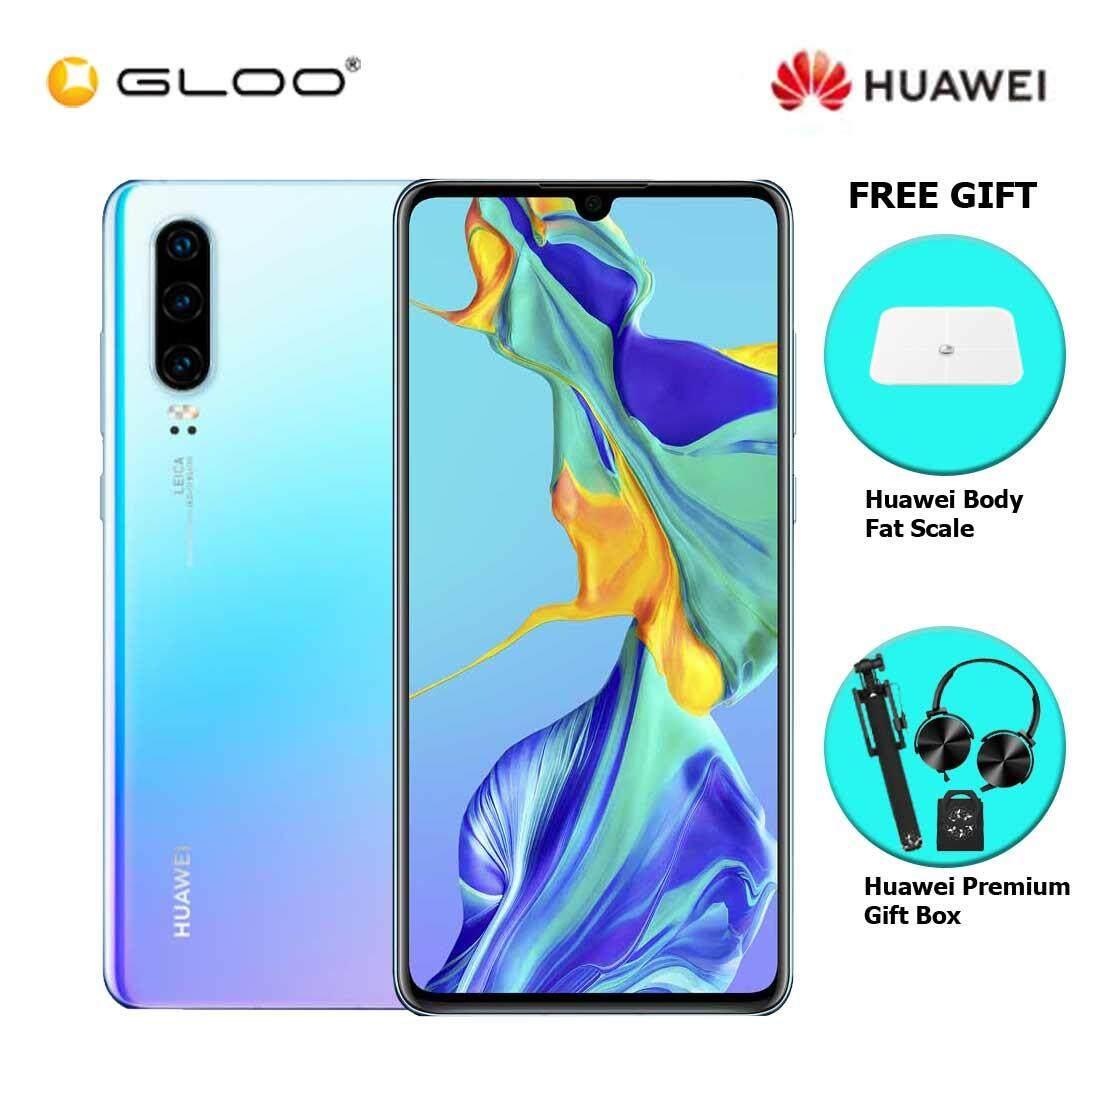 Huawei P30 8GB+128GB Breathing Crystal + FREE Huawei Body Fat Scale 6901443198375,Premium Gift Box (Headset/Selfie Stick/iRing)